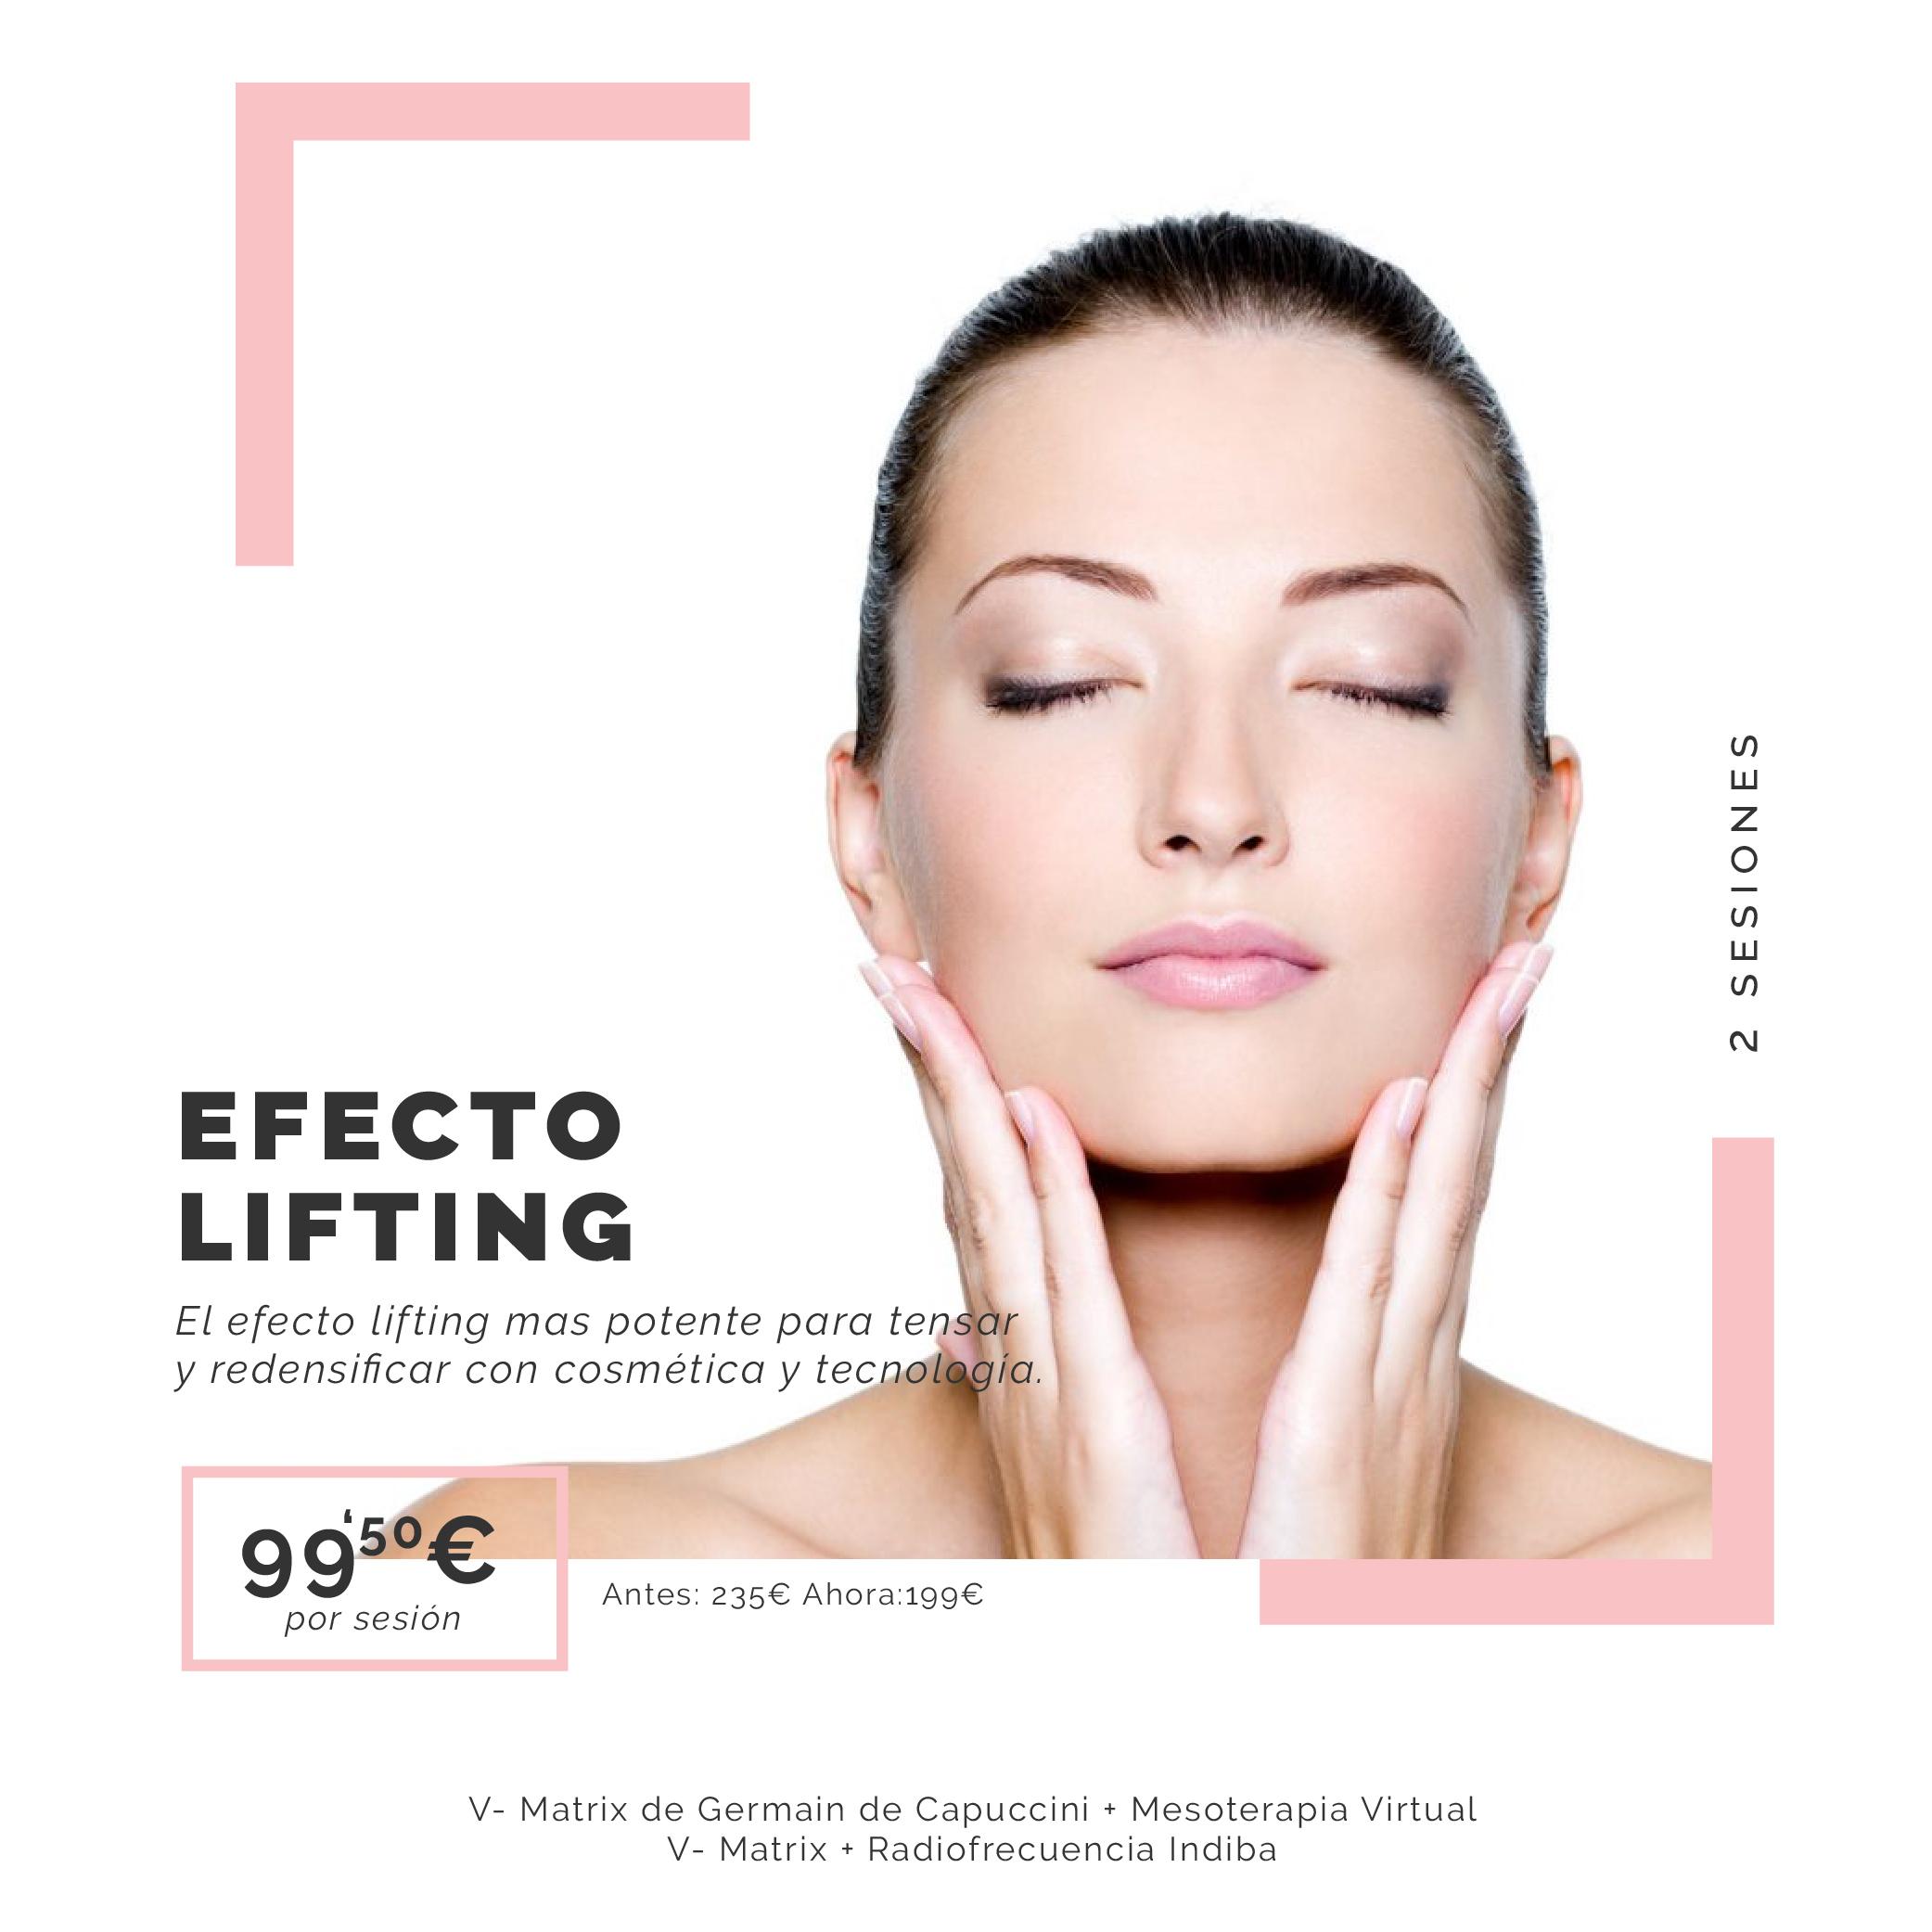 Colágeno efecto lifting - Mila Peris - Centro de Belleza en Valencia